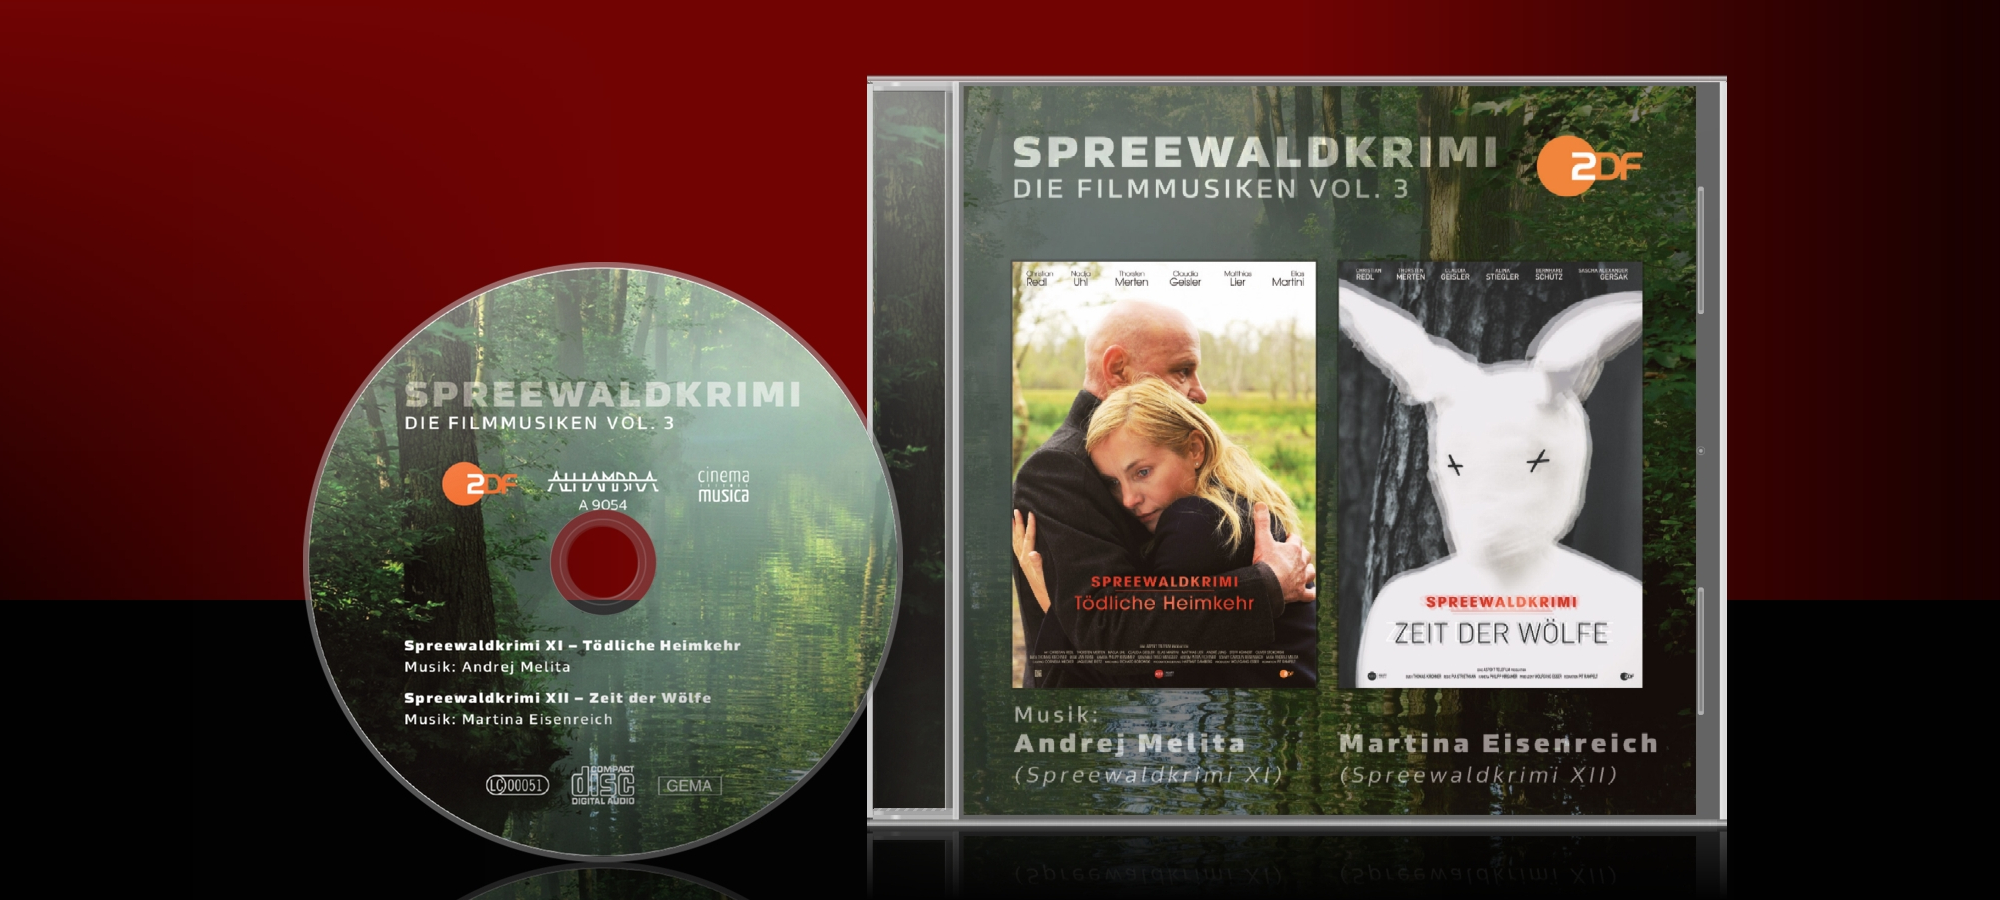 Spreewaldkrimi – Die Filmmusiken Vol. 3